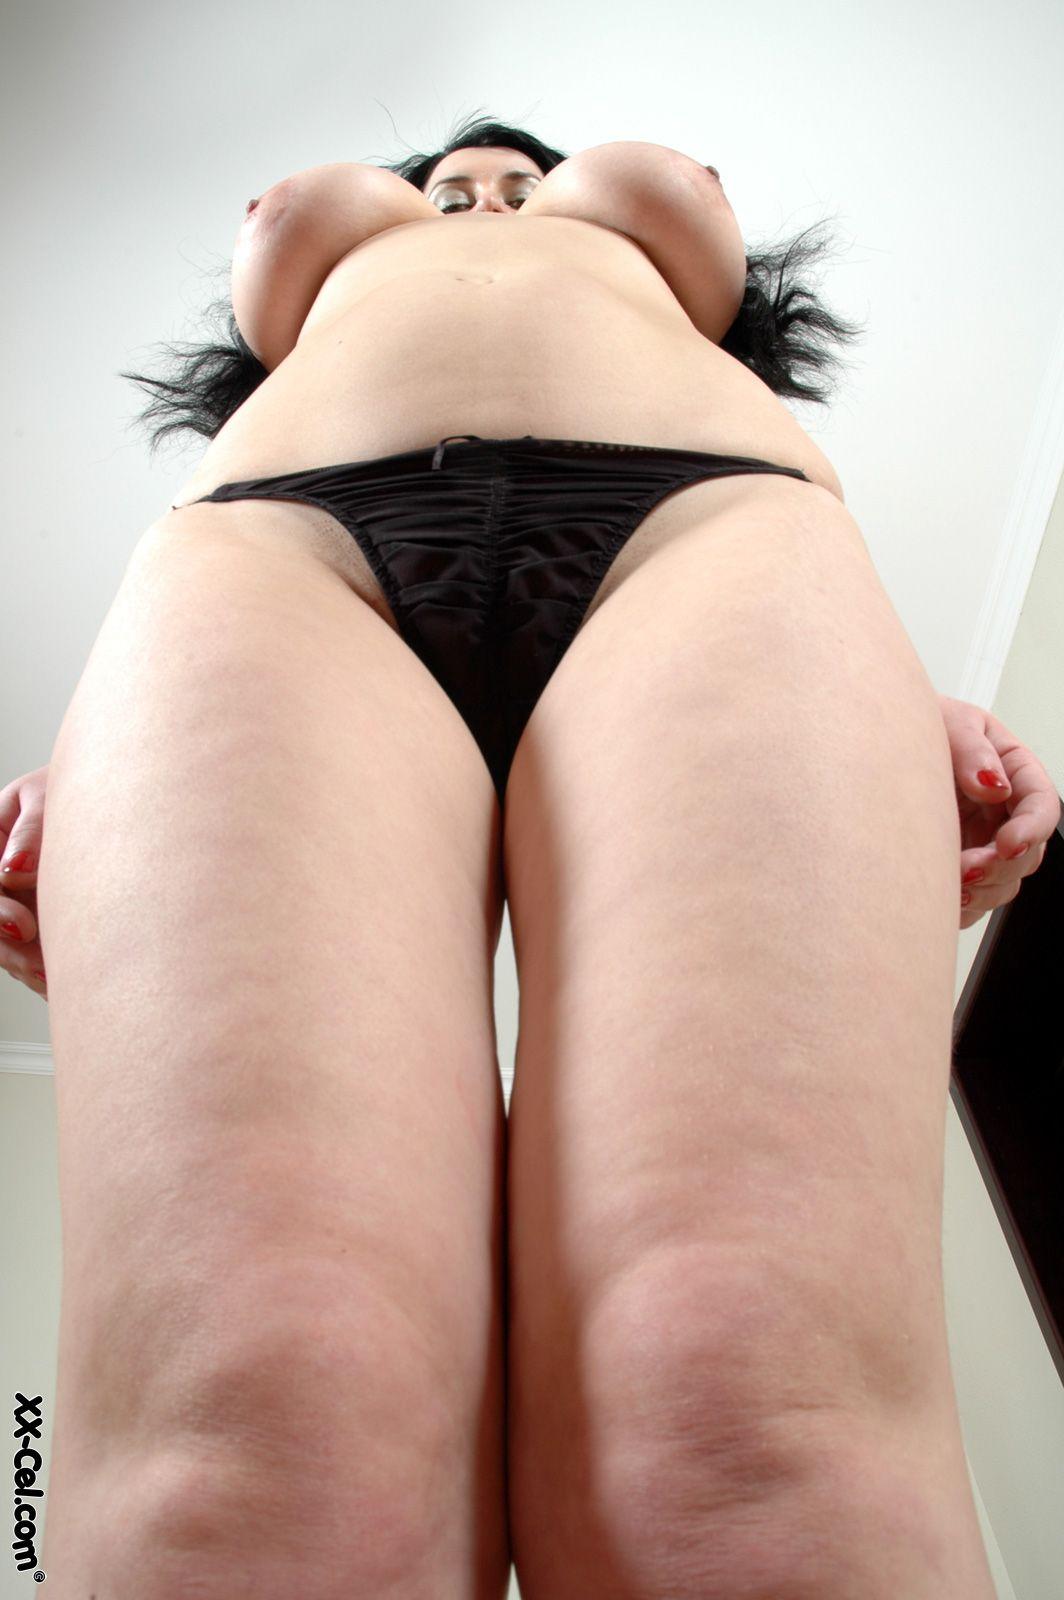 young boobs